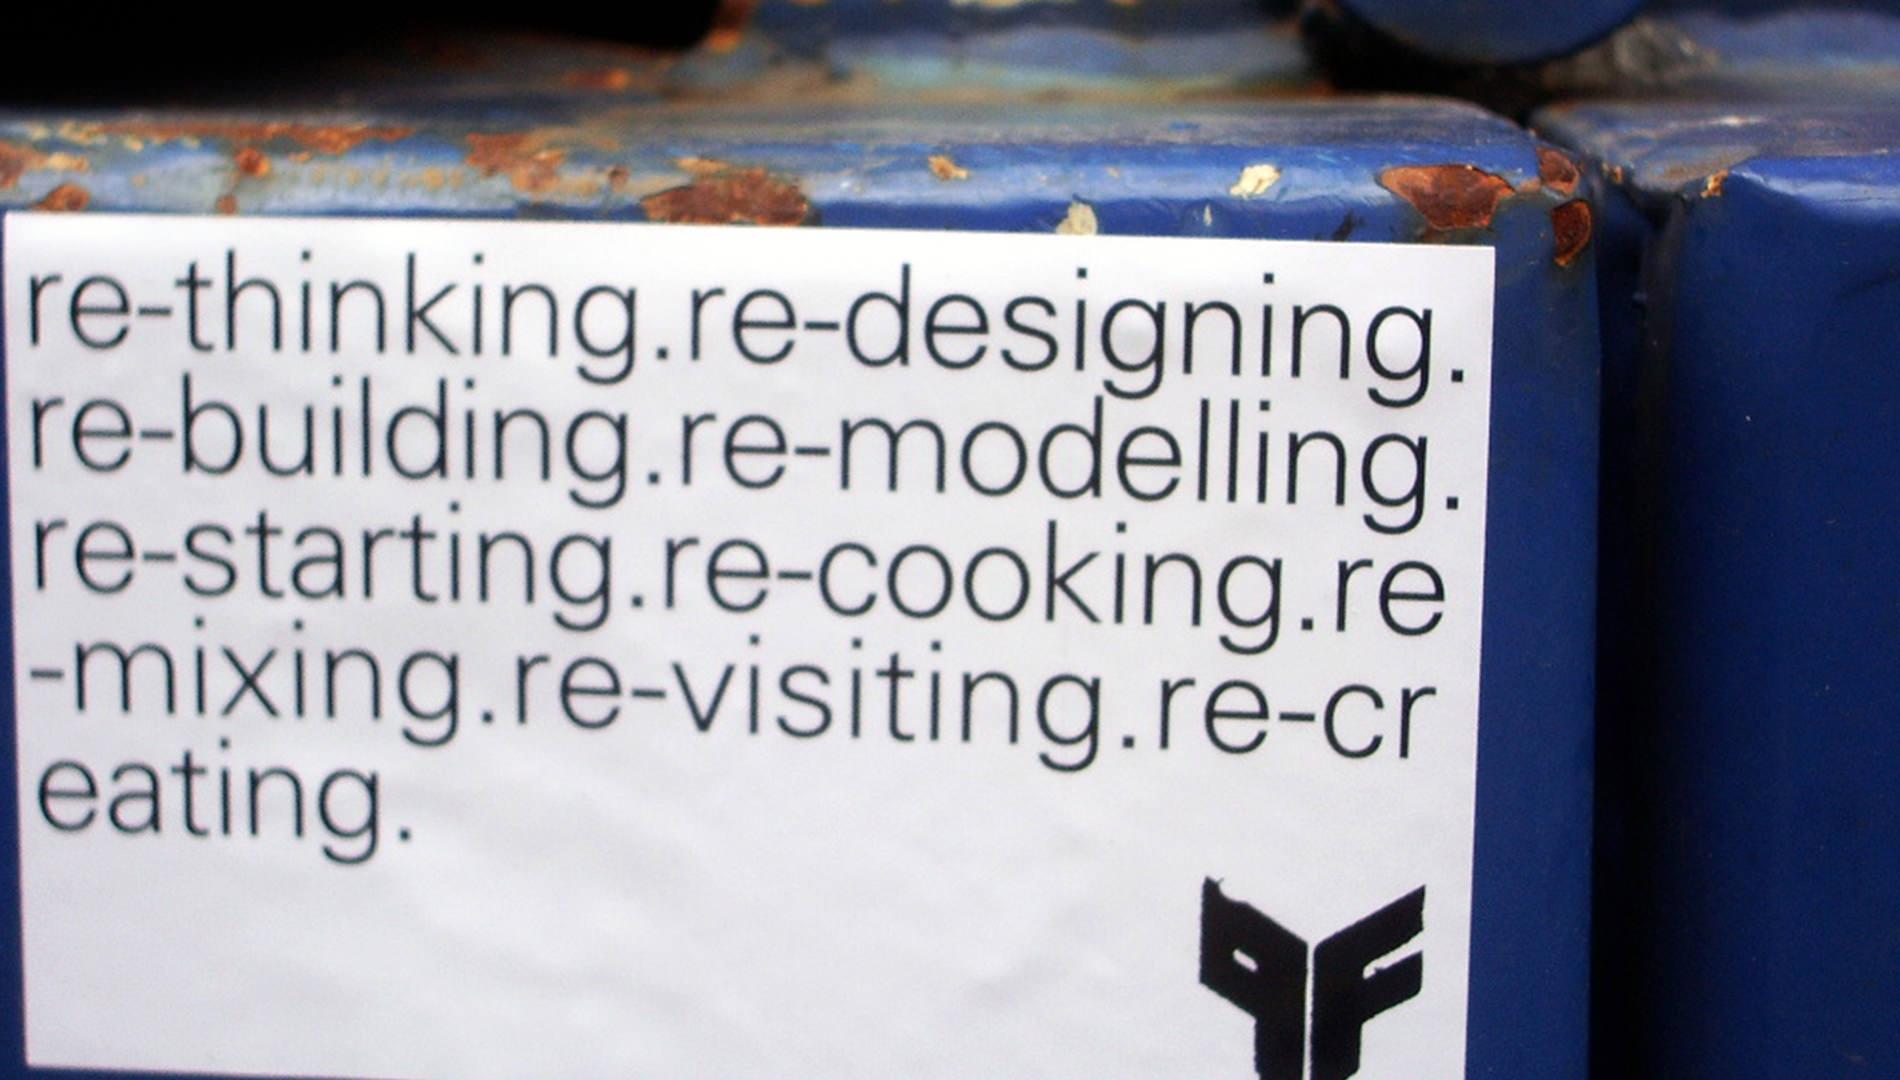 Messe Design Live Kommunikation Kopenhagen VW Projekt Fox Re-Definition, Re-Design Going Places EventLabs